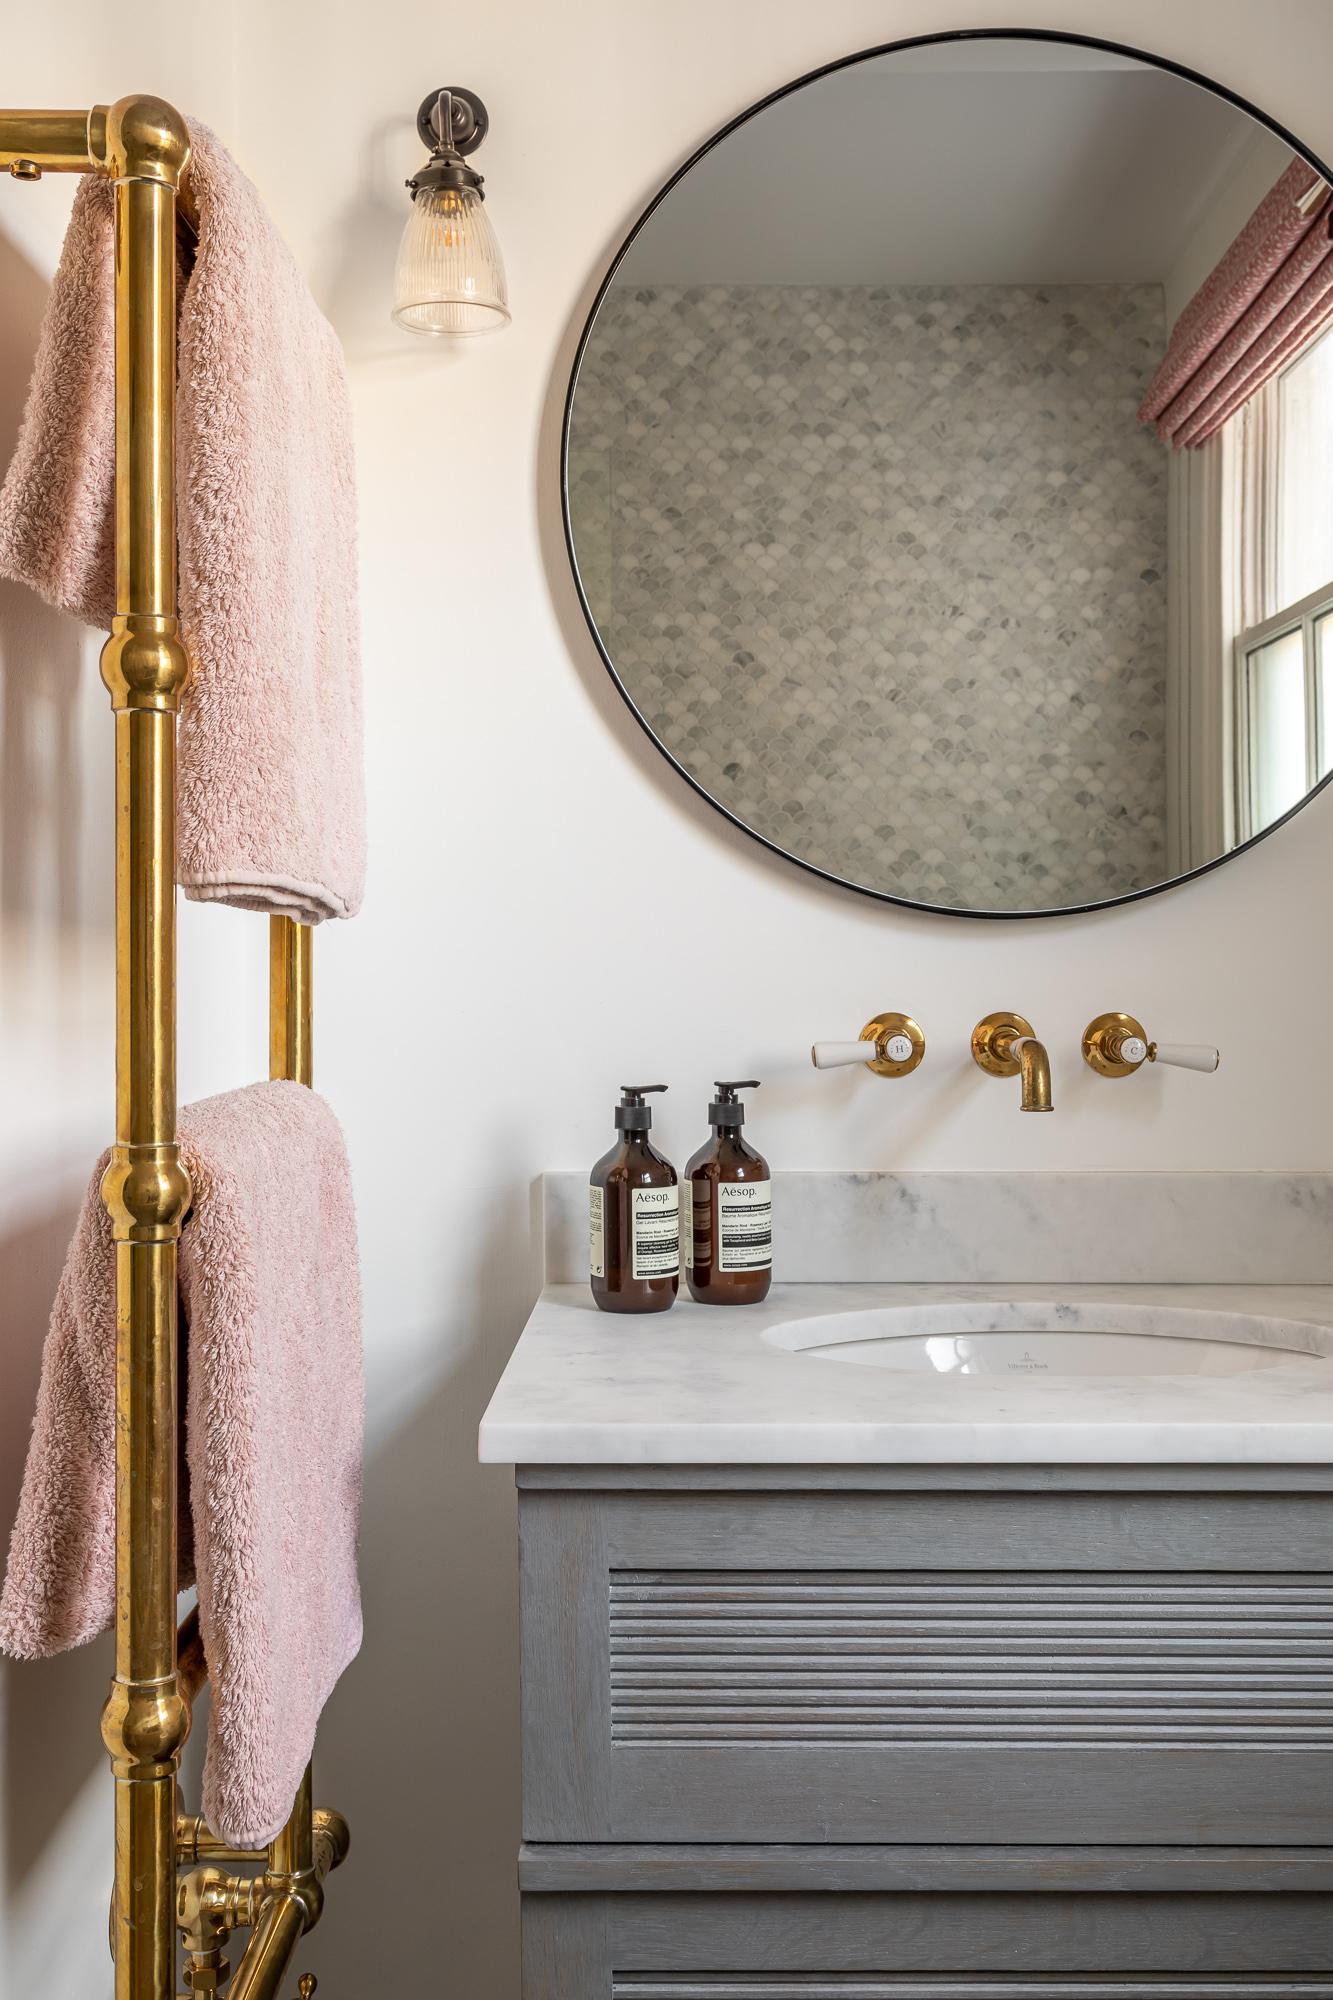 jonathan bond, bathroom wash basin & round wall mirror, clapham, london